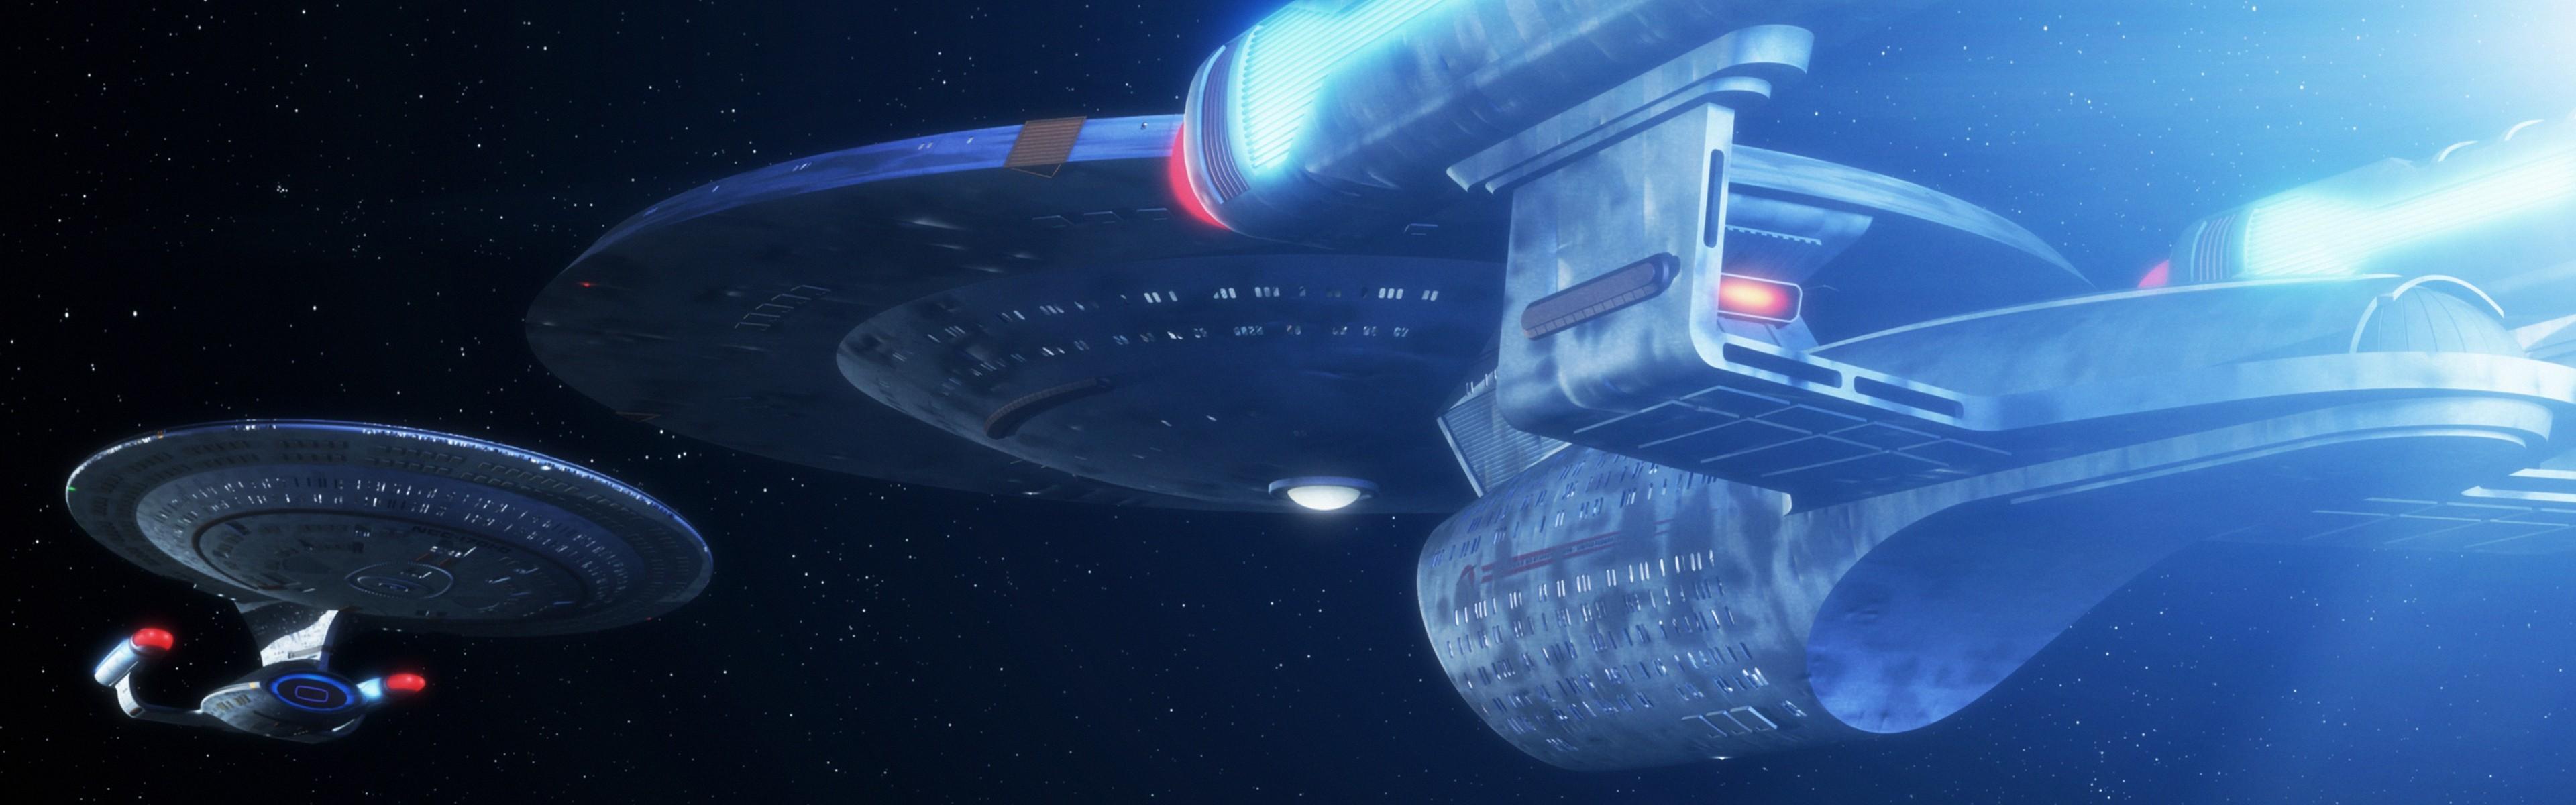 104+ Dual Monitor Star Trek